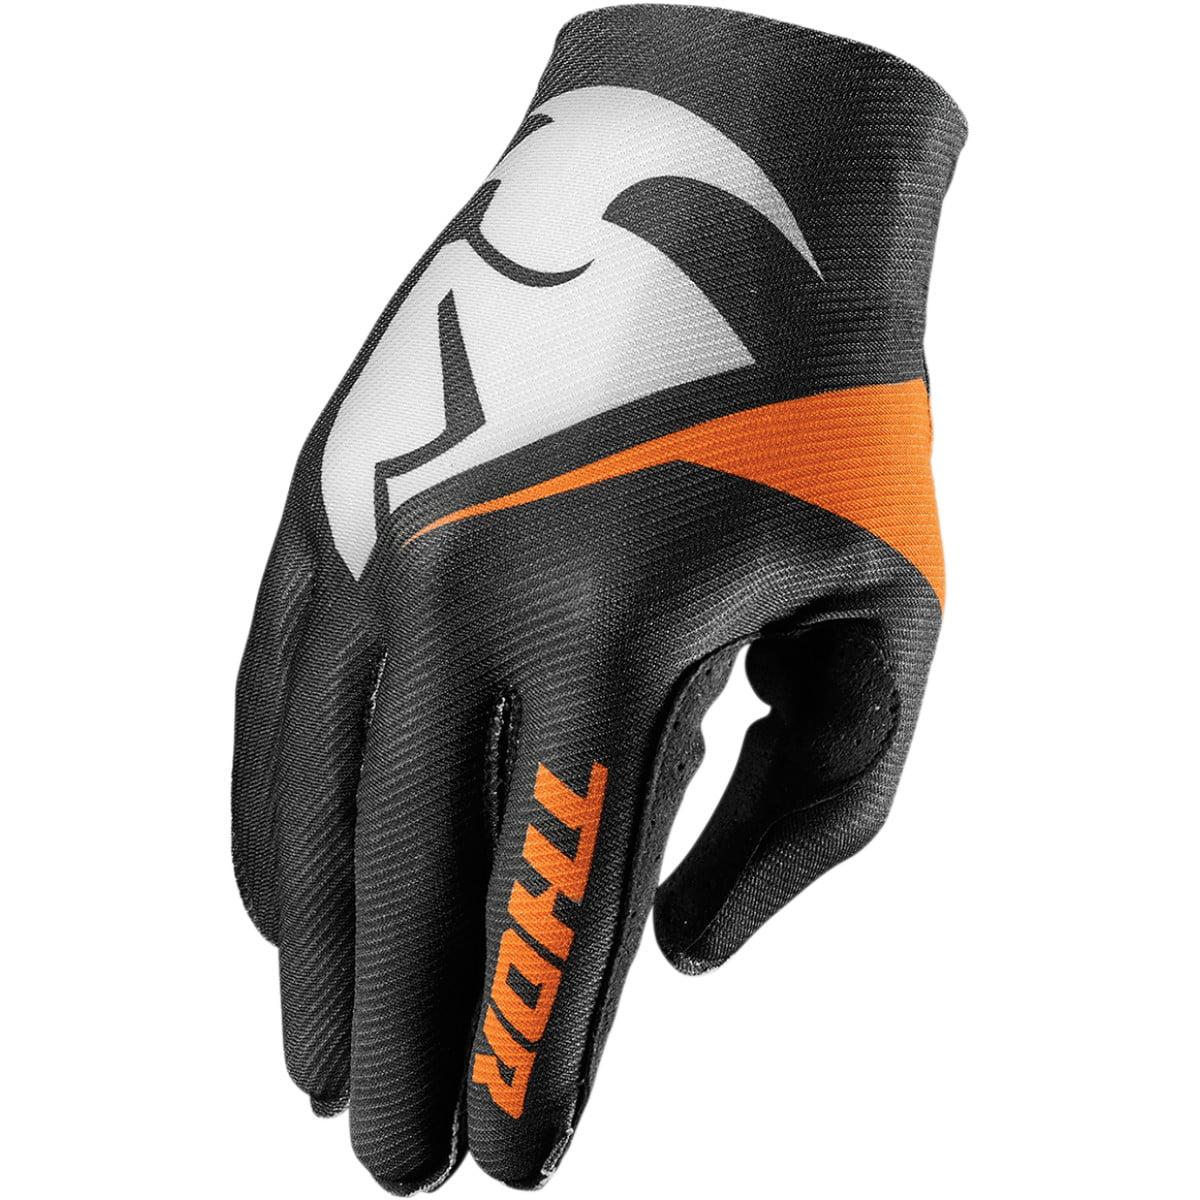 Thor Invert Gloves Short Cuff (Flection Black, X-Small)